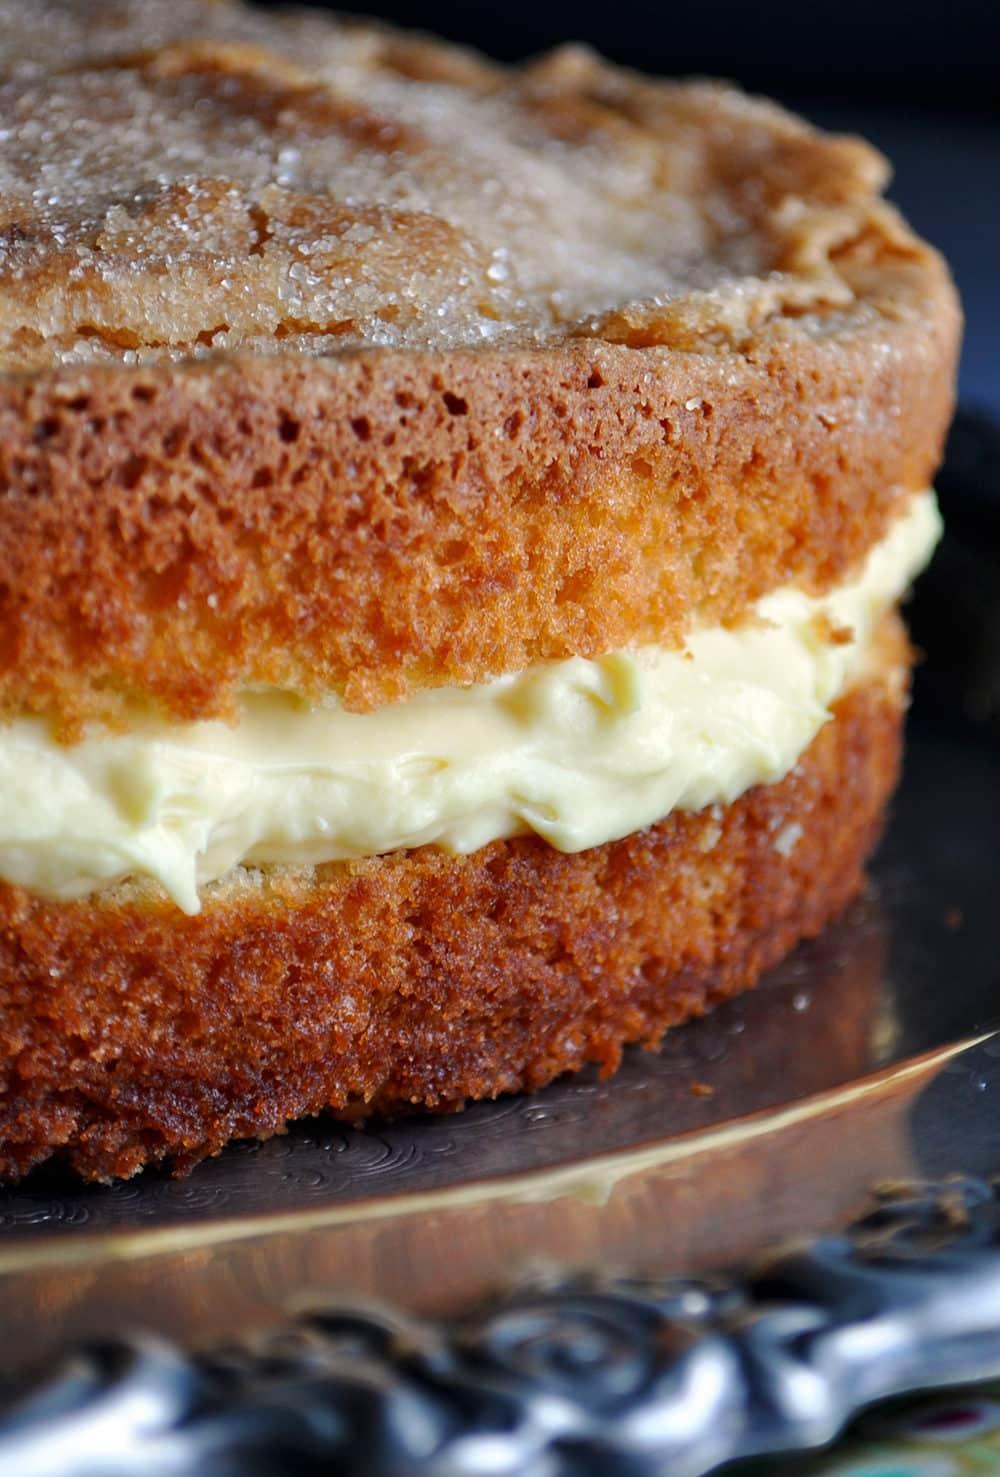 Olive Oil Cake with Lemon Mascarpone Cream Filling